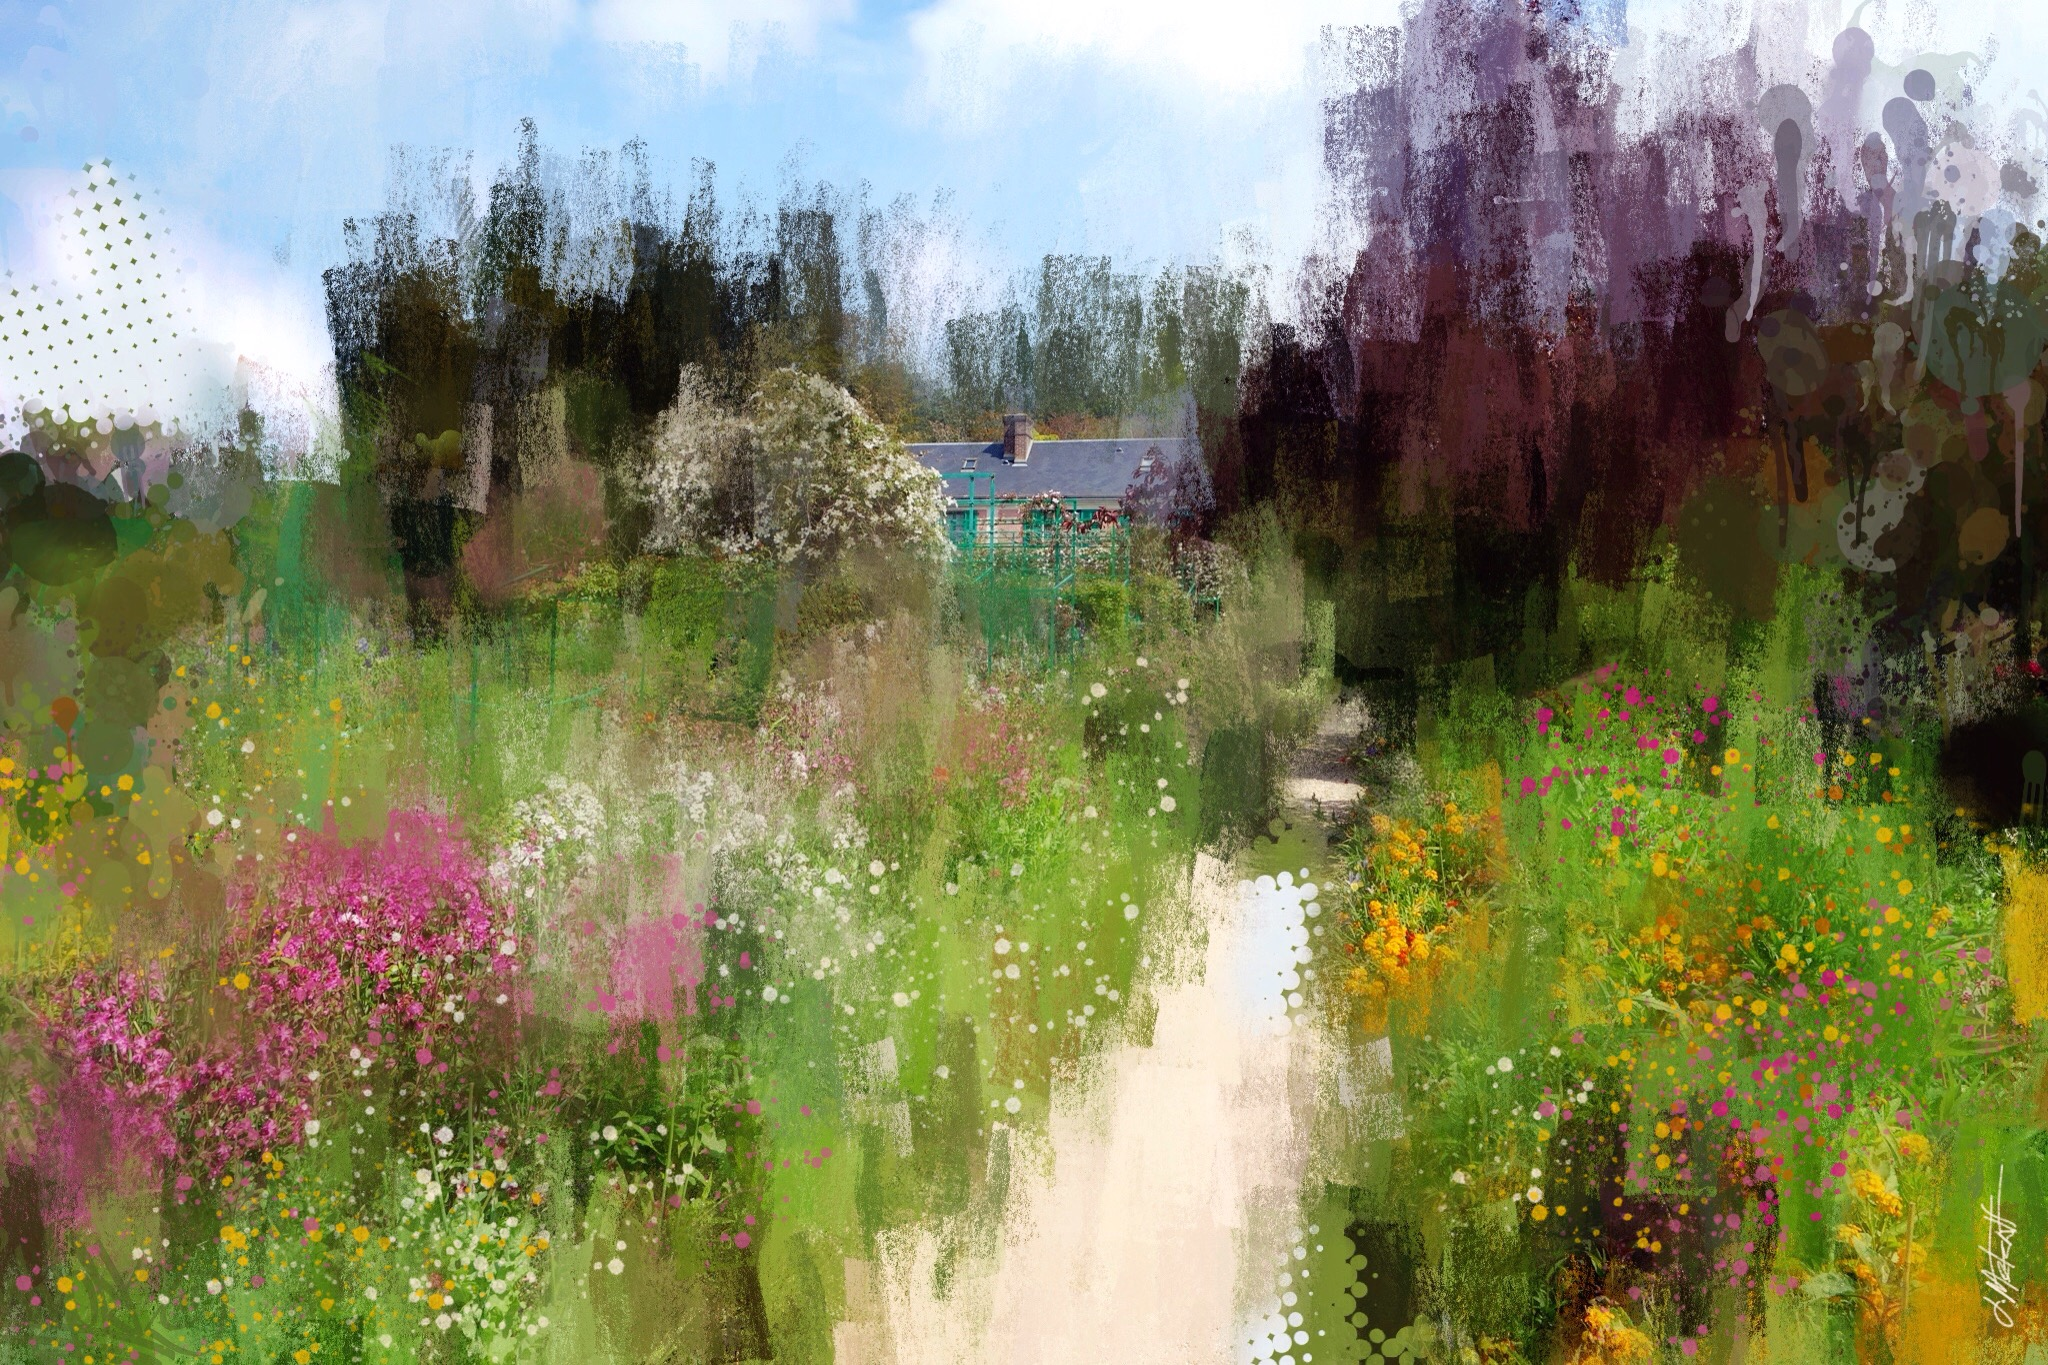 James Metcalf ~ Monet's Home and Gardens